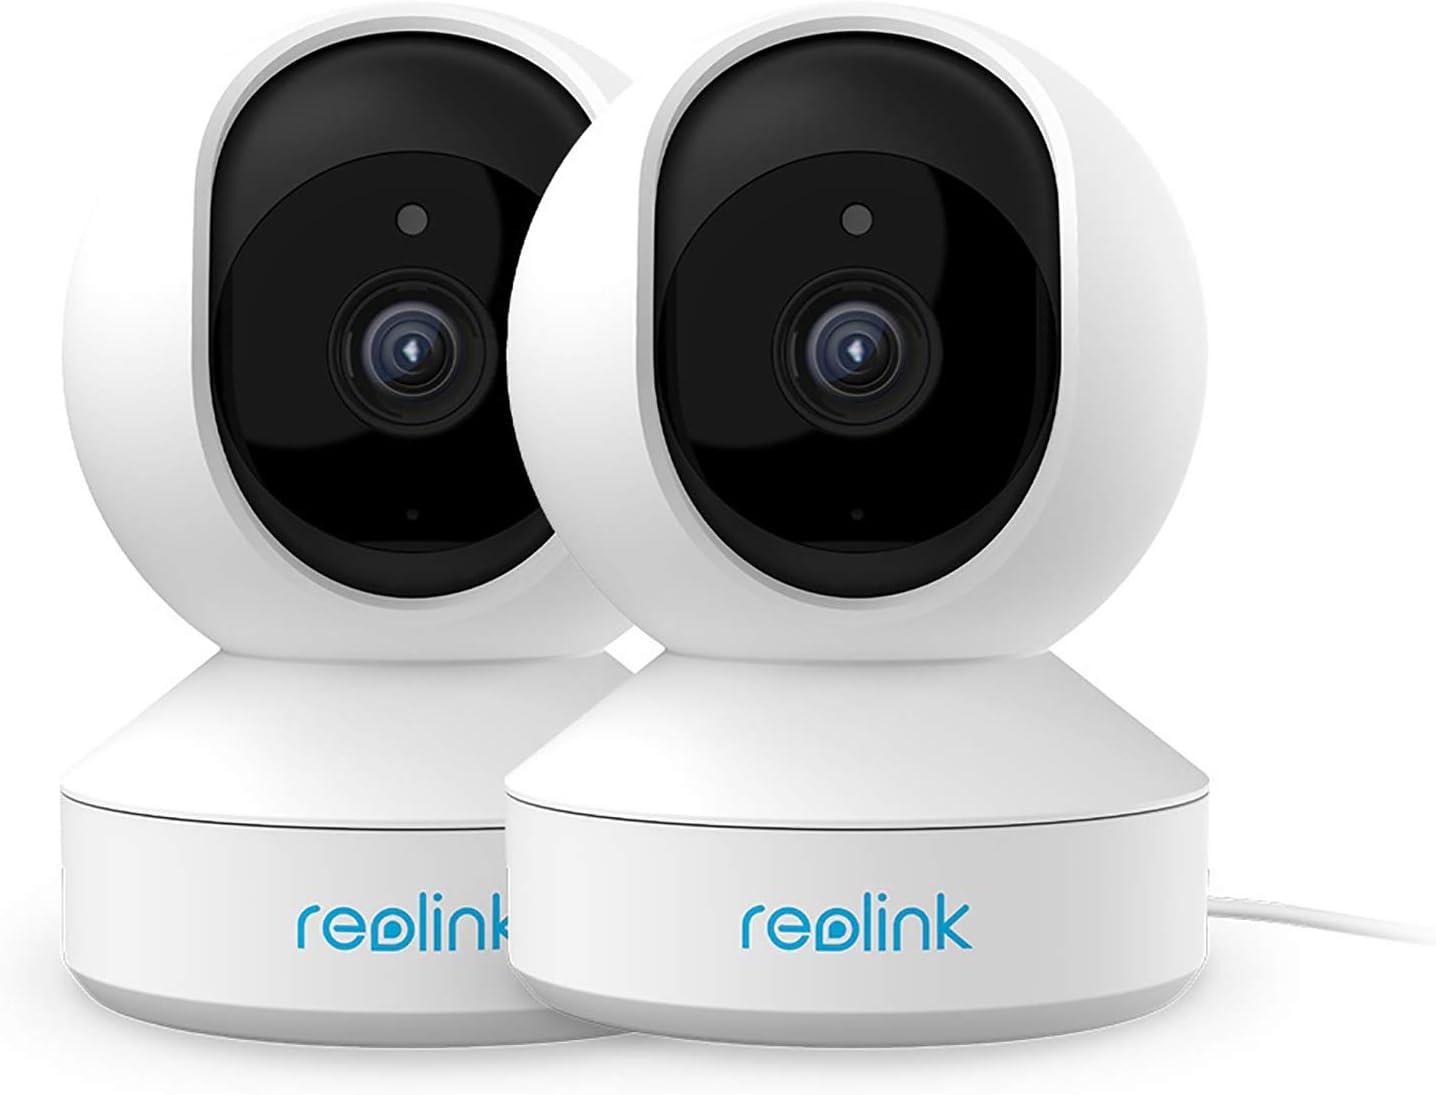 Reolink 3MP Super HD Caméra de Surveillance Intérieure sans Fil, Caméra IP...